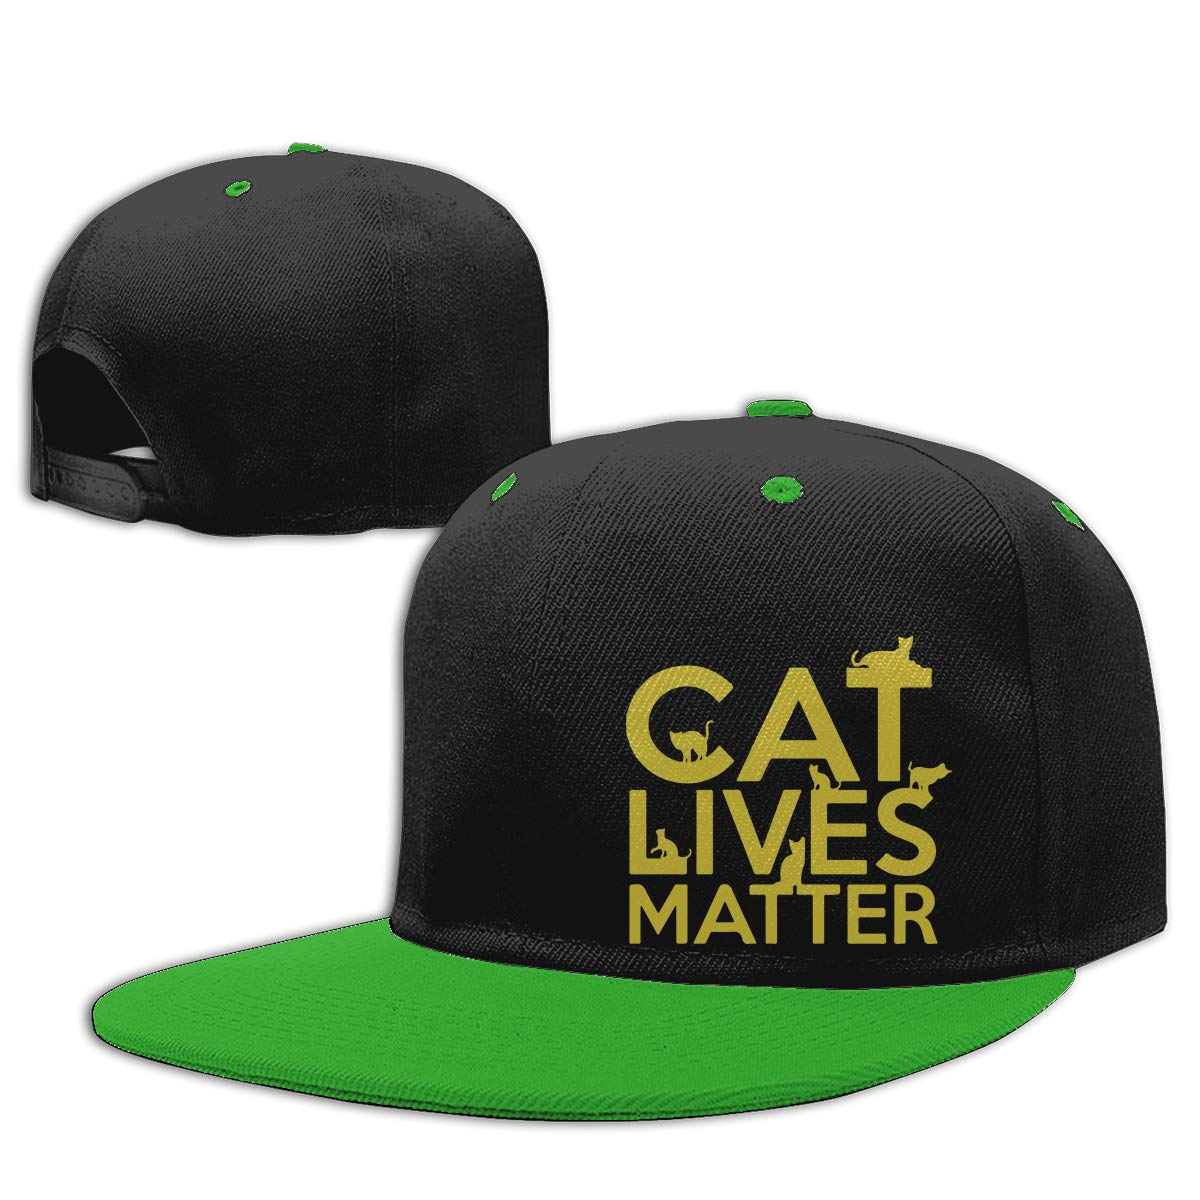 Men and Women Hiphop Cap Cat Lives Matter2 Unisex Hip-Hop Baseball Caps